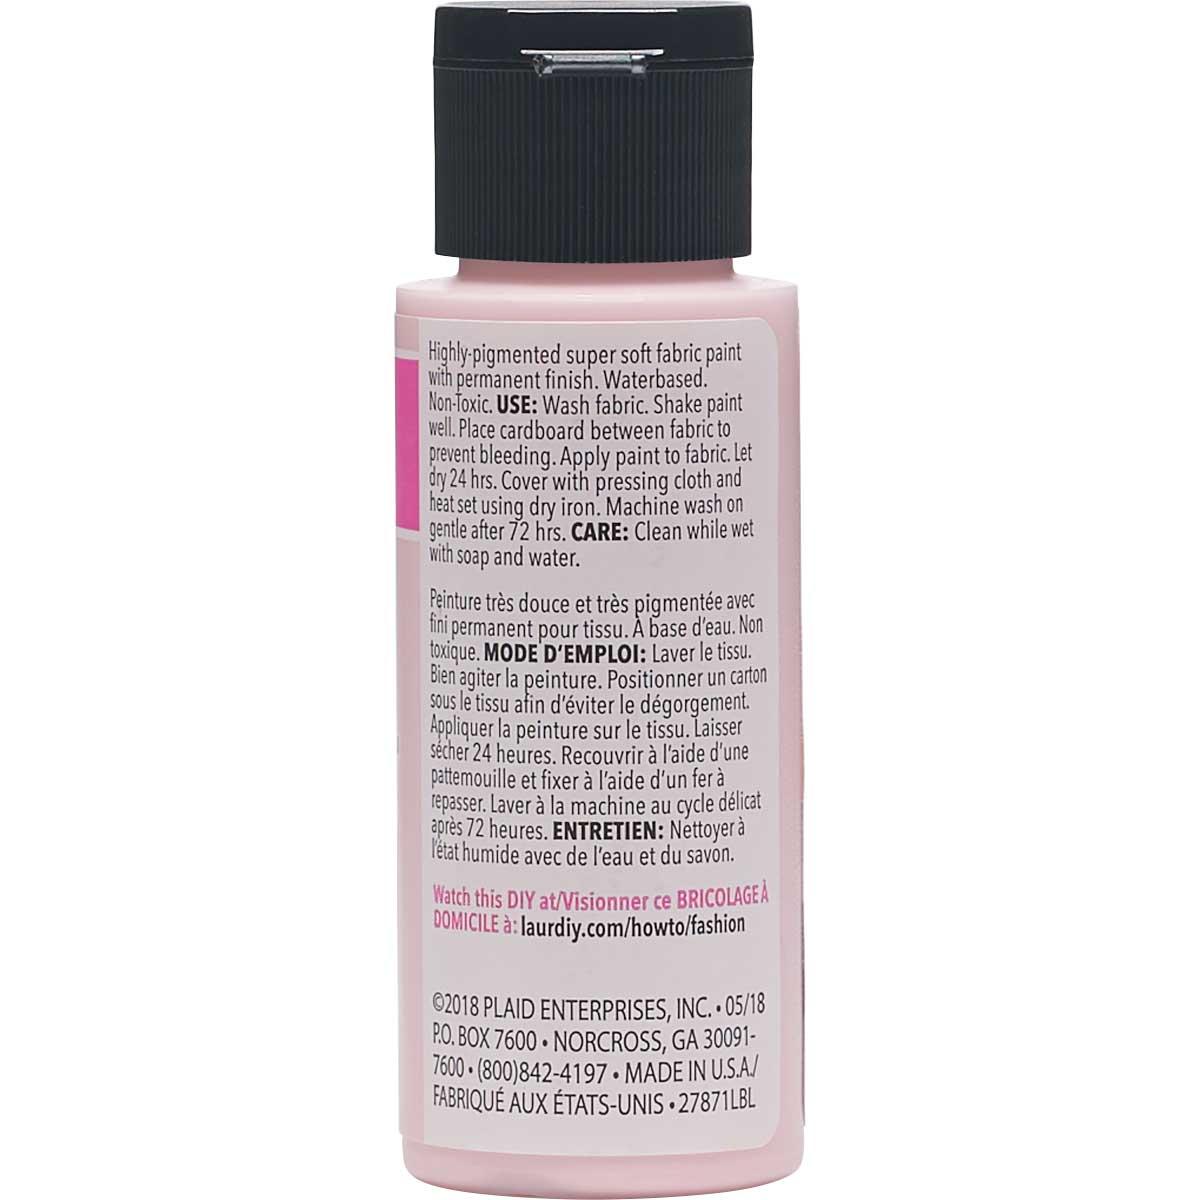 LaurDIY ® Perfect Fabric Paint - Pinky Swear, 2 oz.